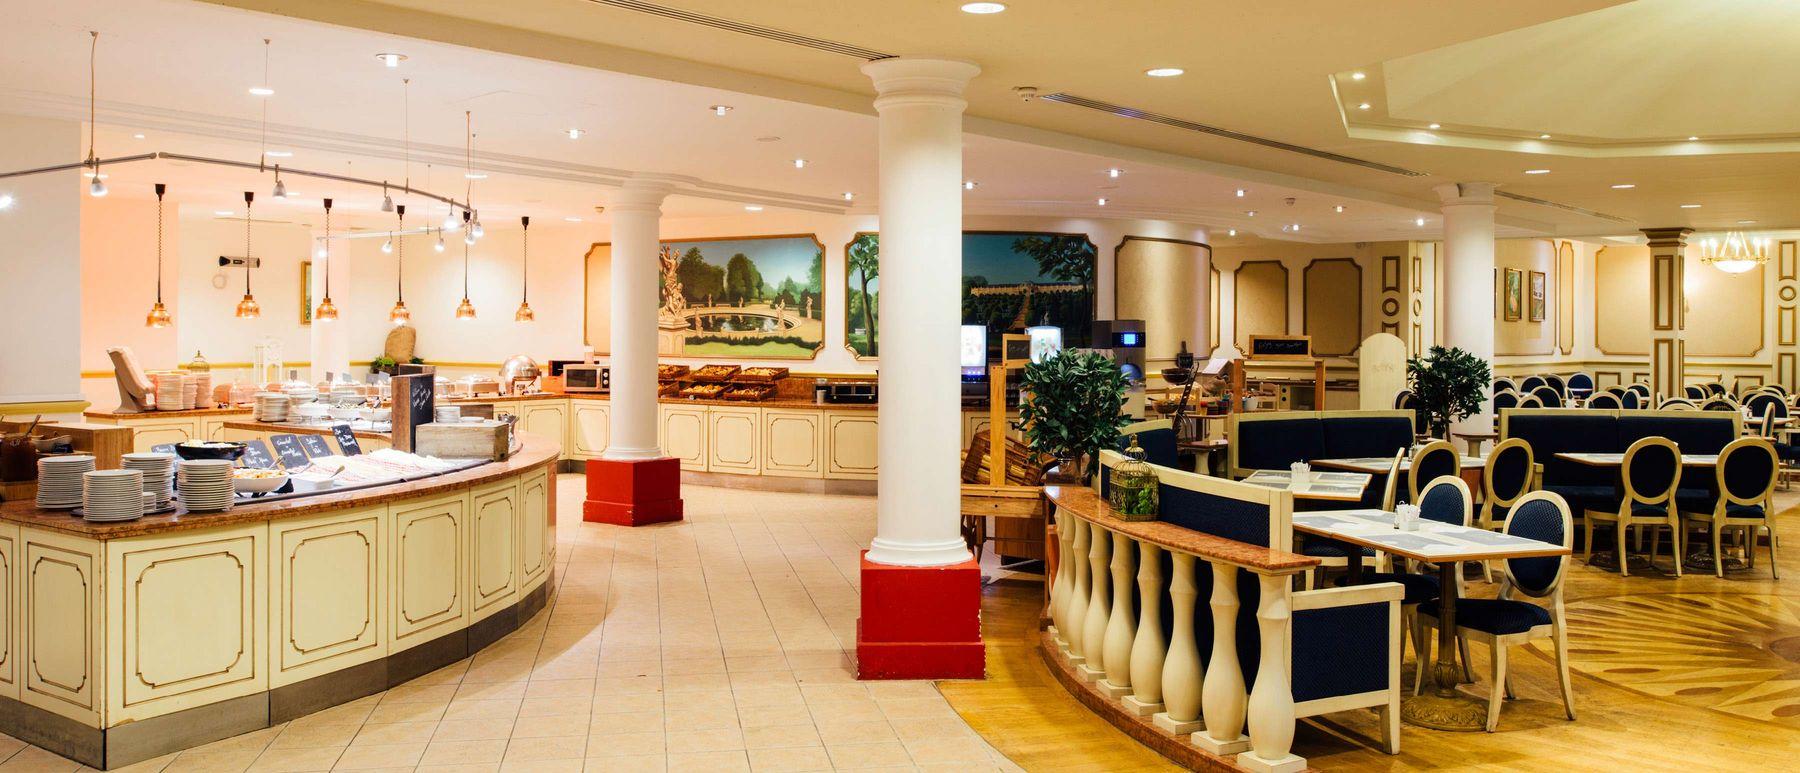 csm_dream-castle-paris-breakfast-restaurant_96a8c2fae5.jpg